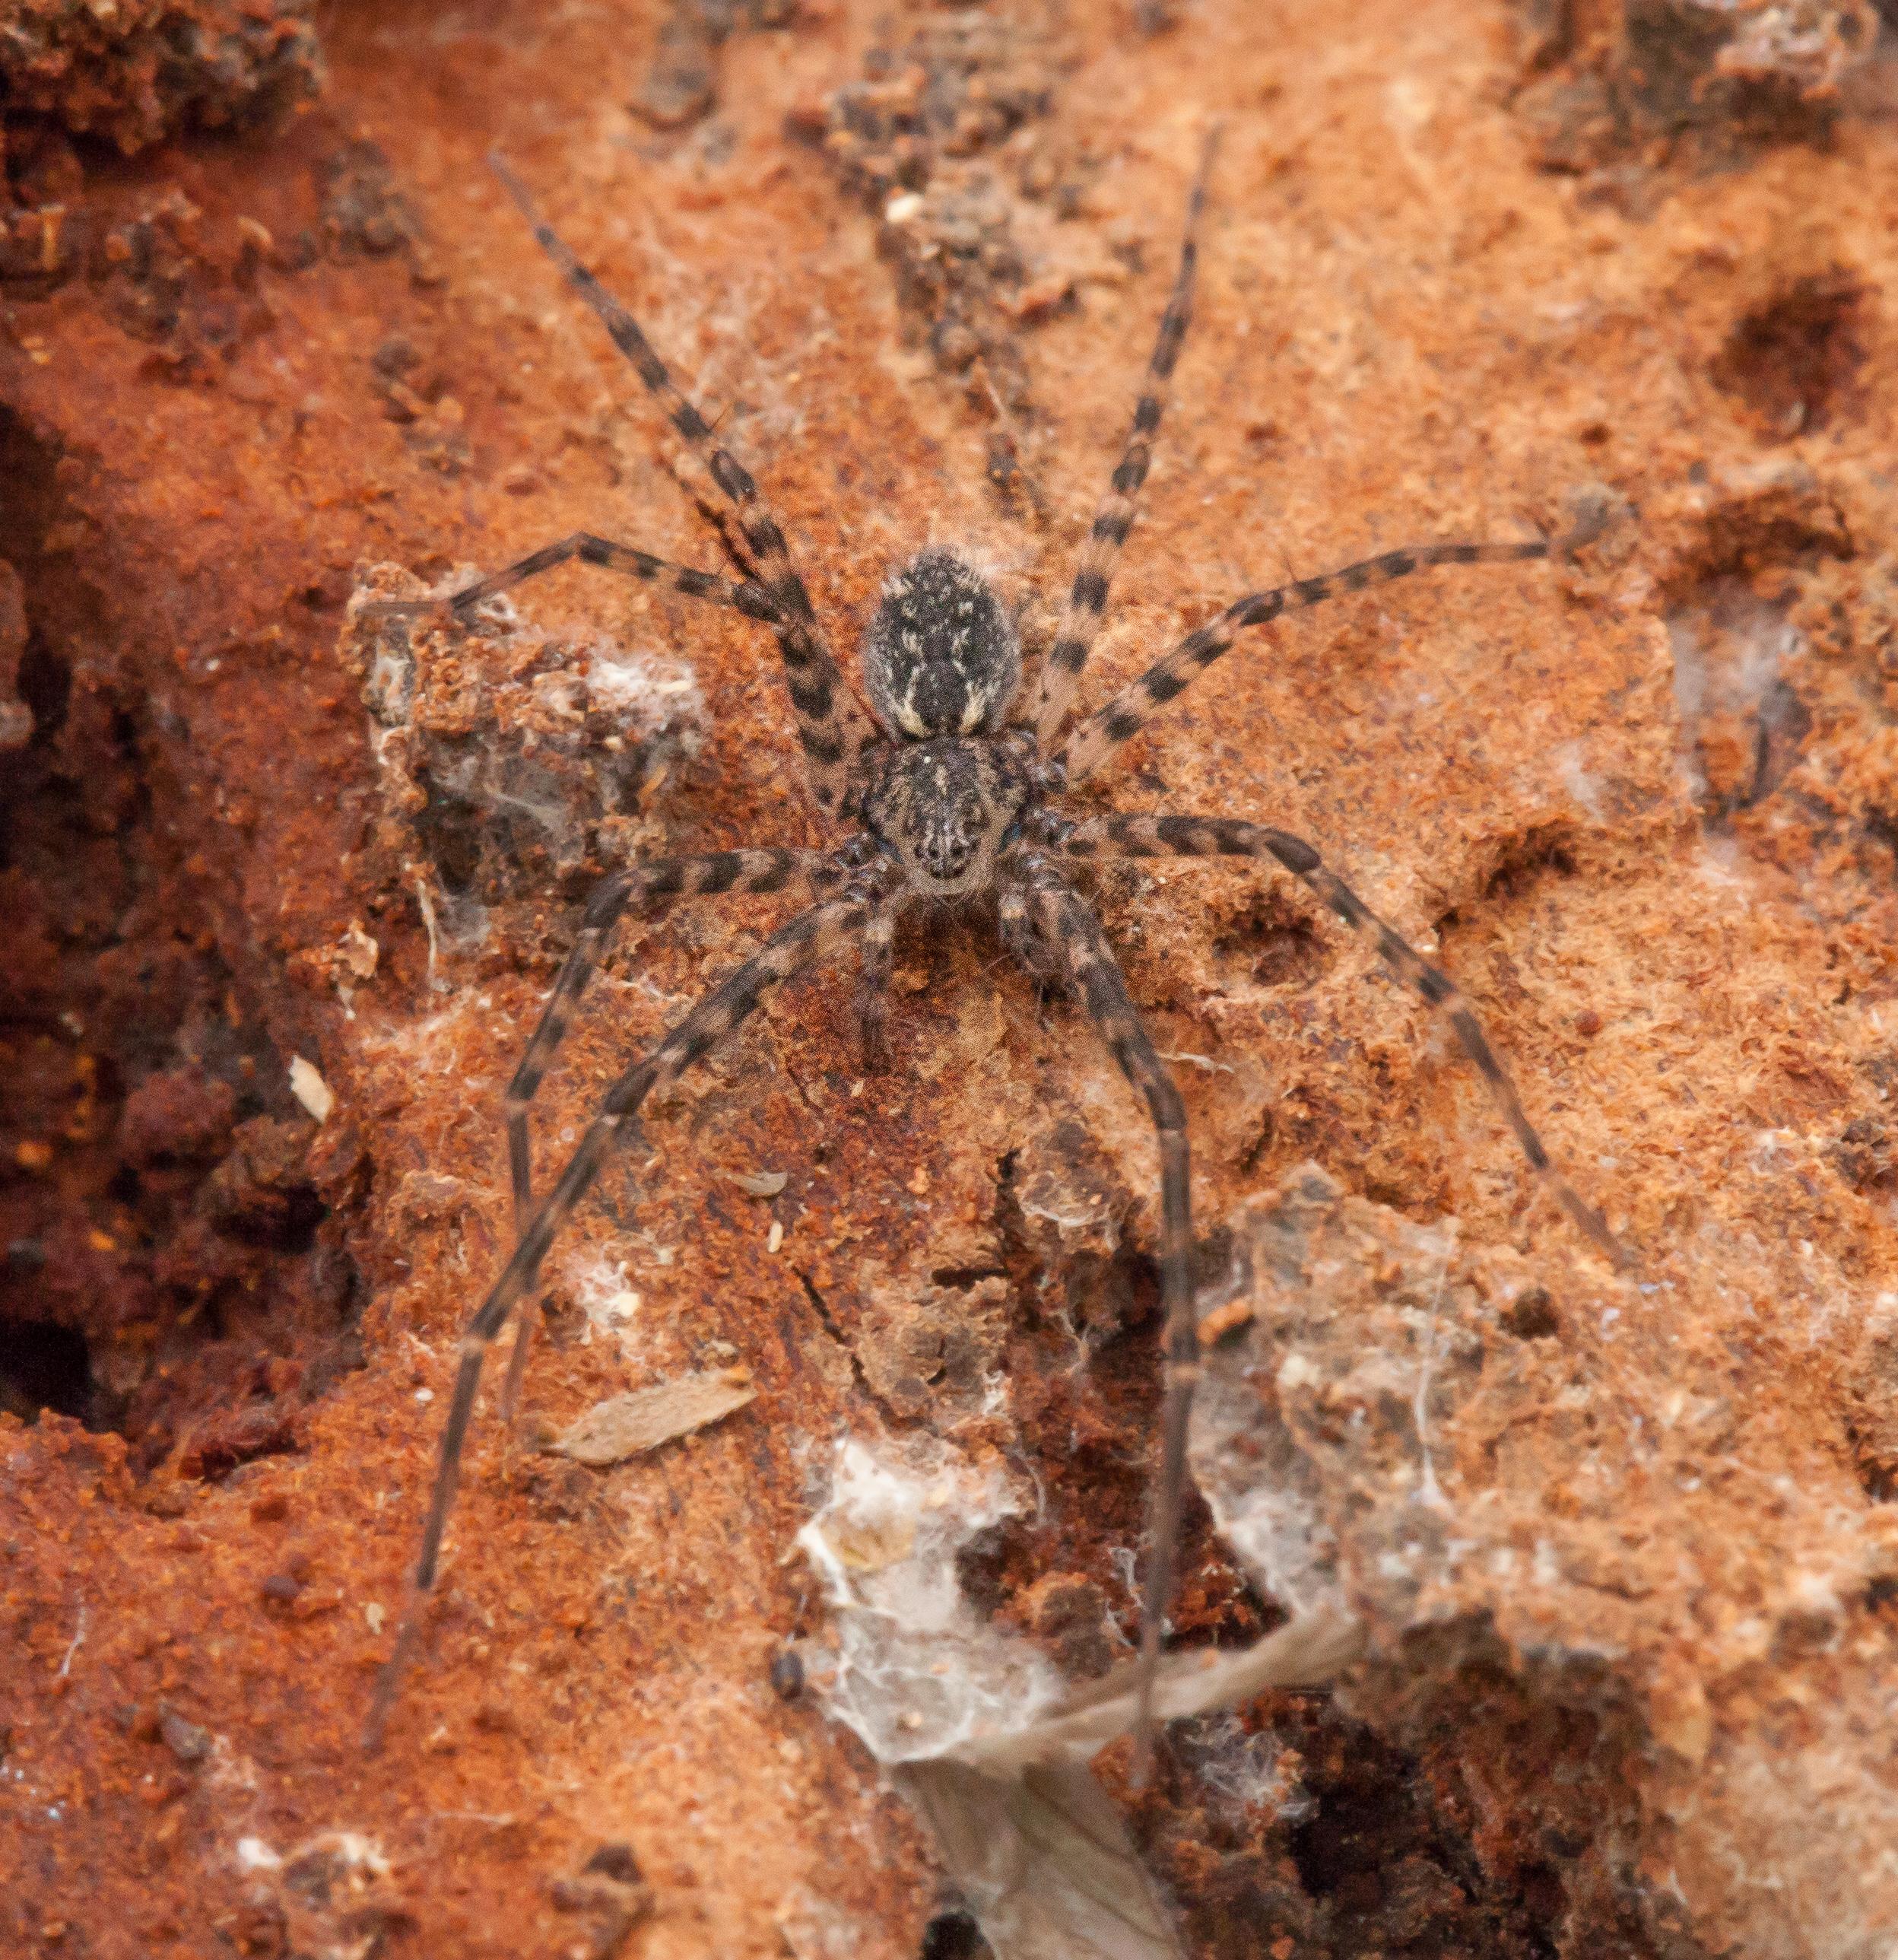 Sombrero spider